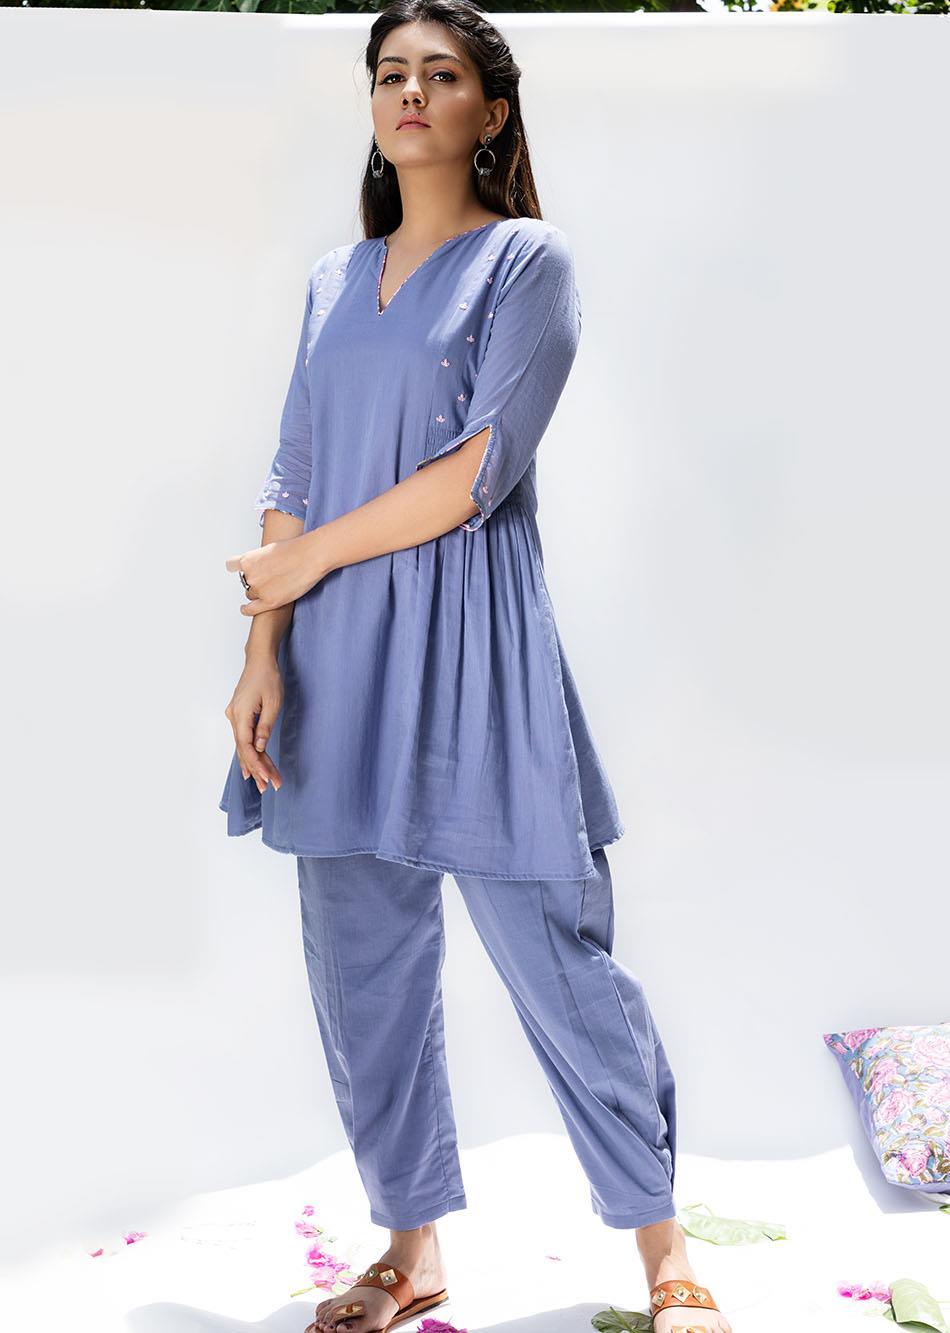 Baiguni short kurta and pant (set of 2) By Jovi Fashion